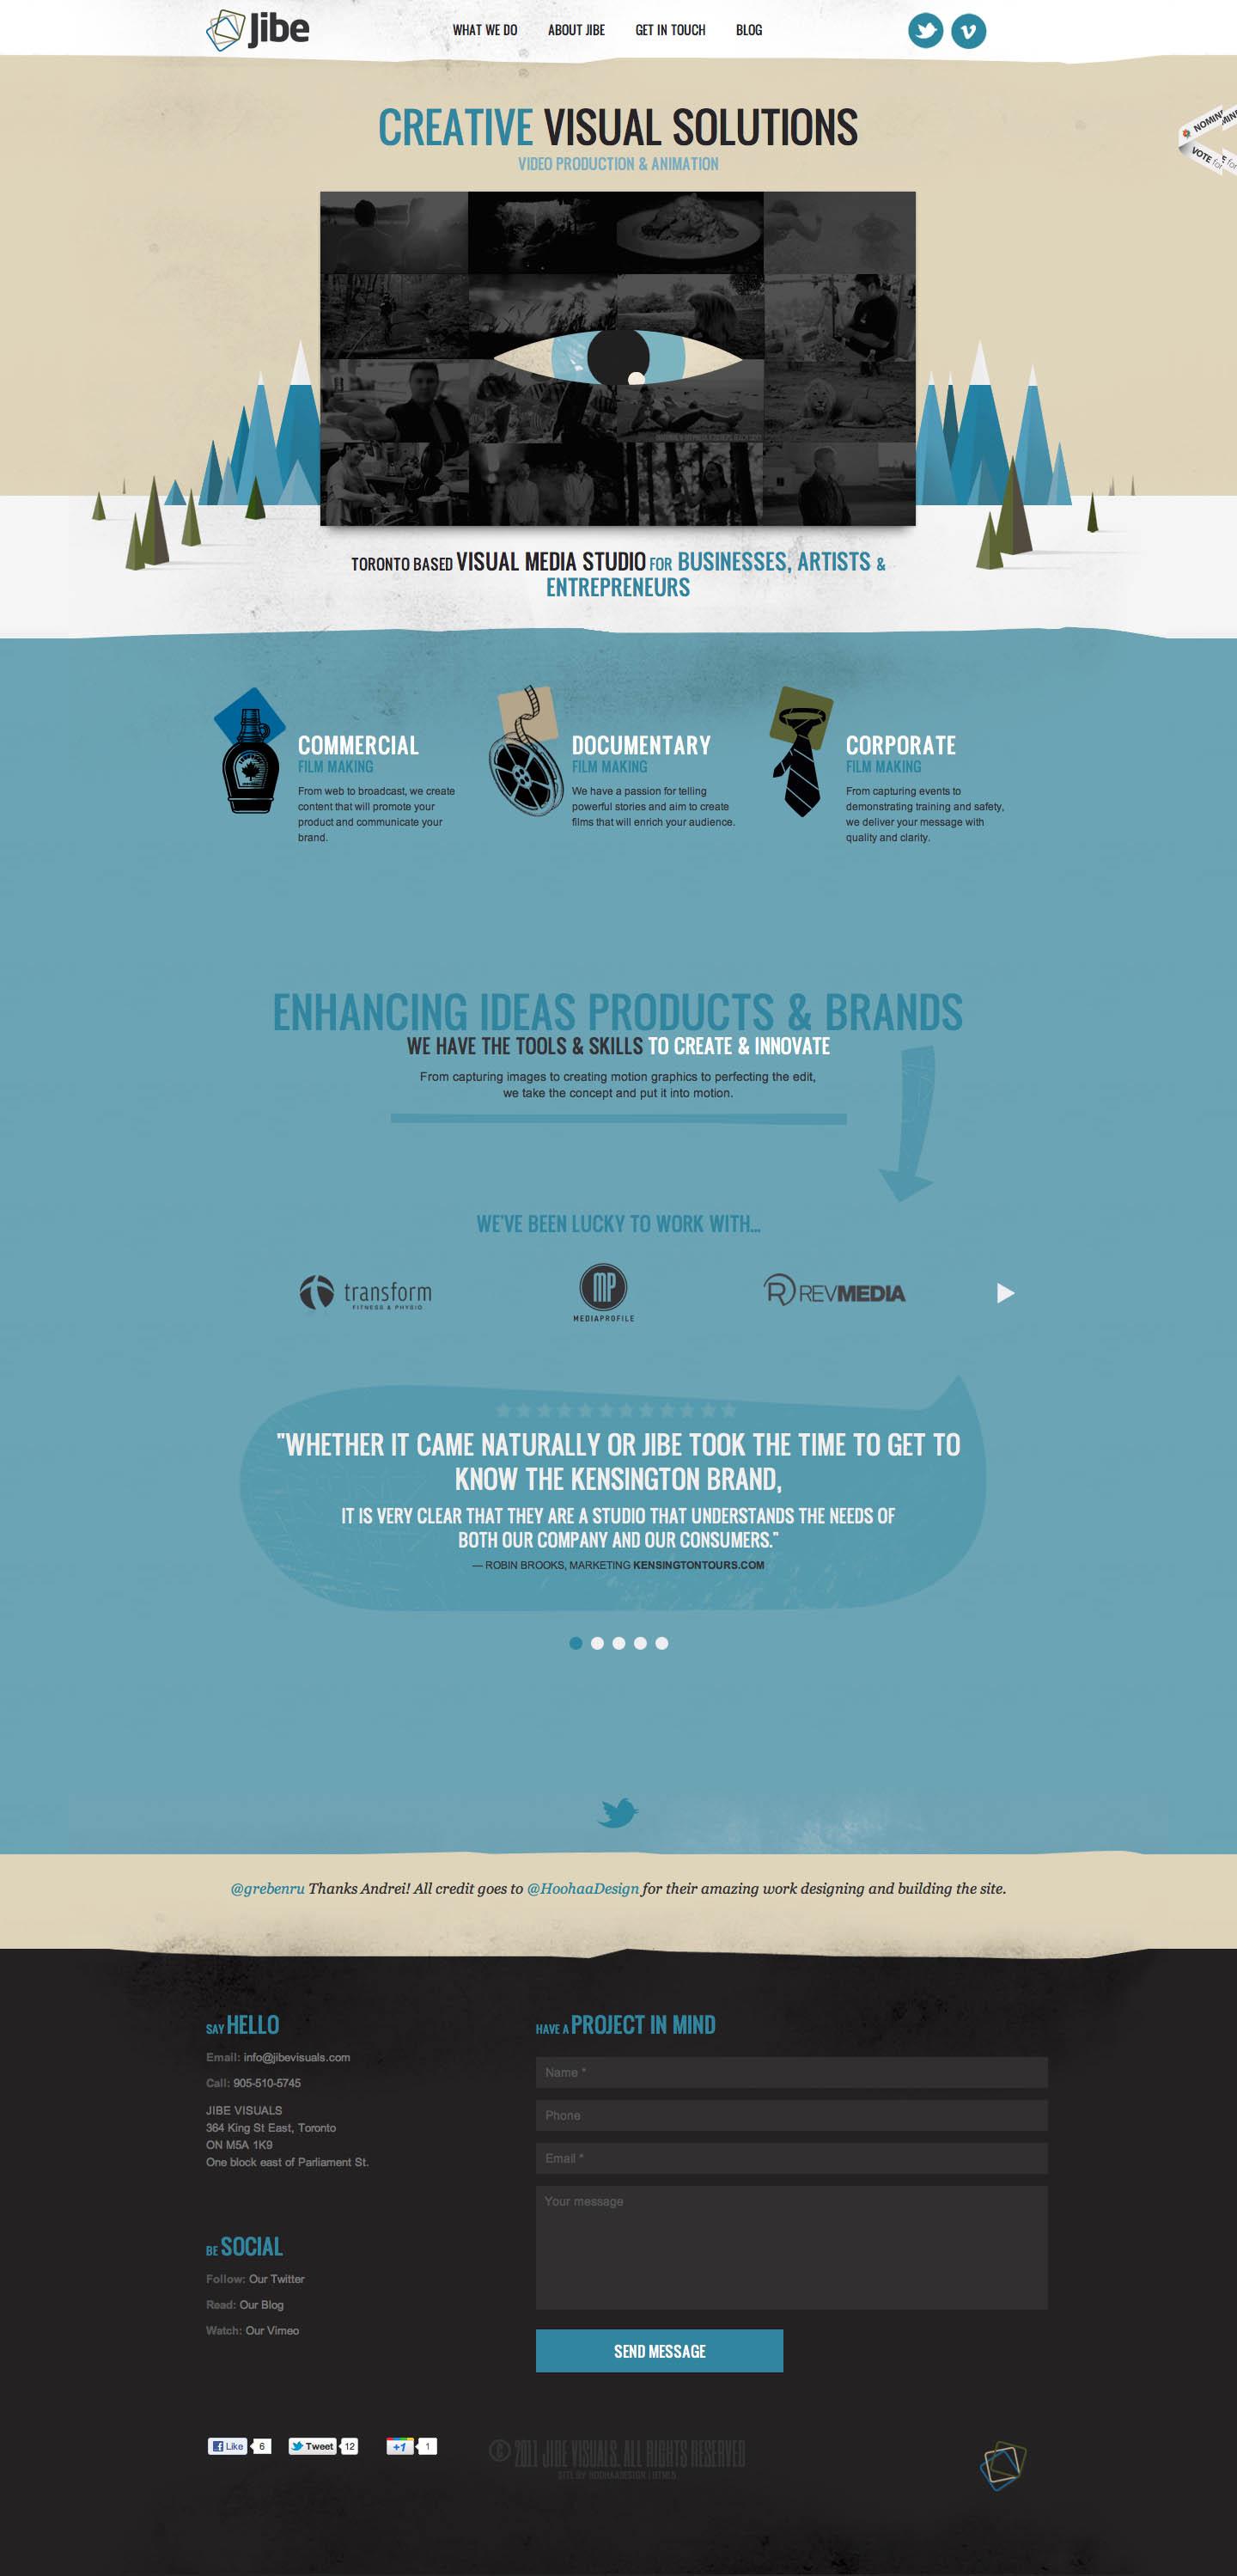 Jibe Visuals Website Screenshot